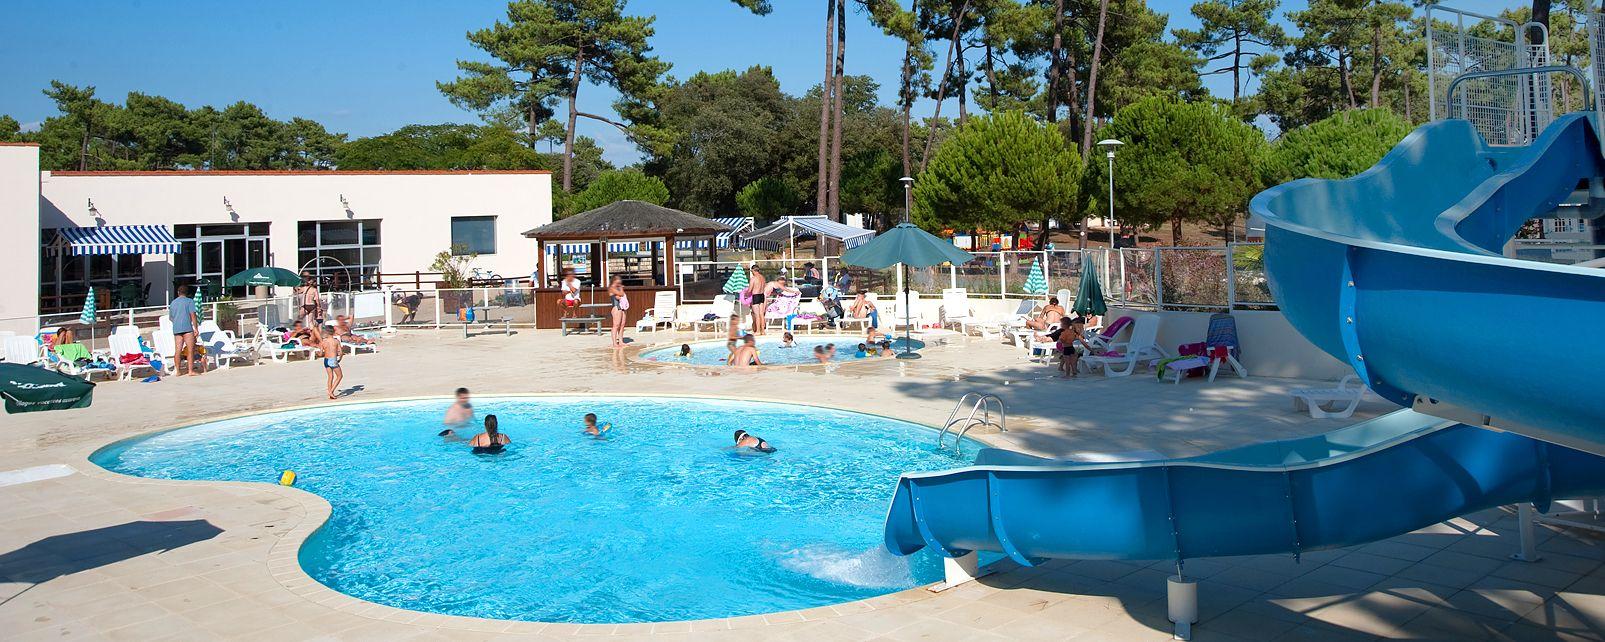 Village Vacances Azureva Ile d'Oléron